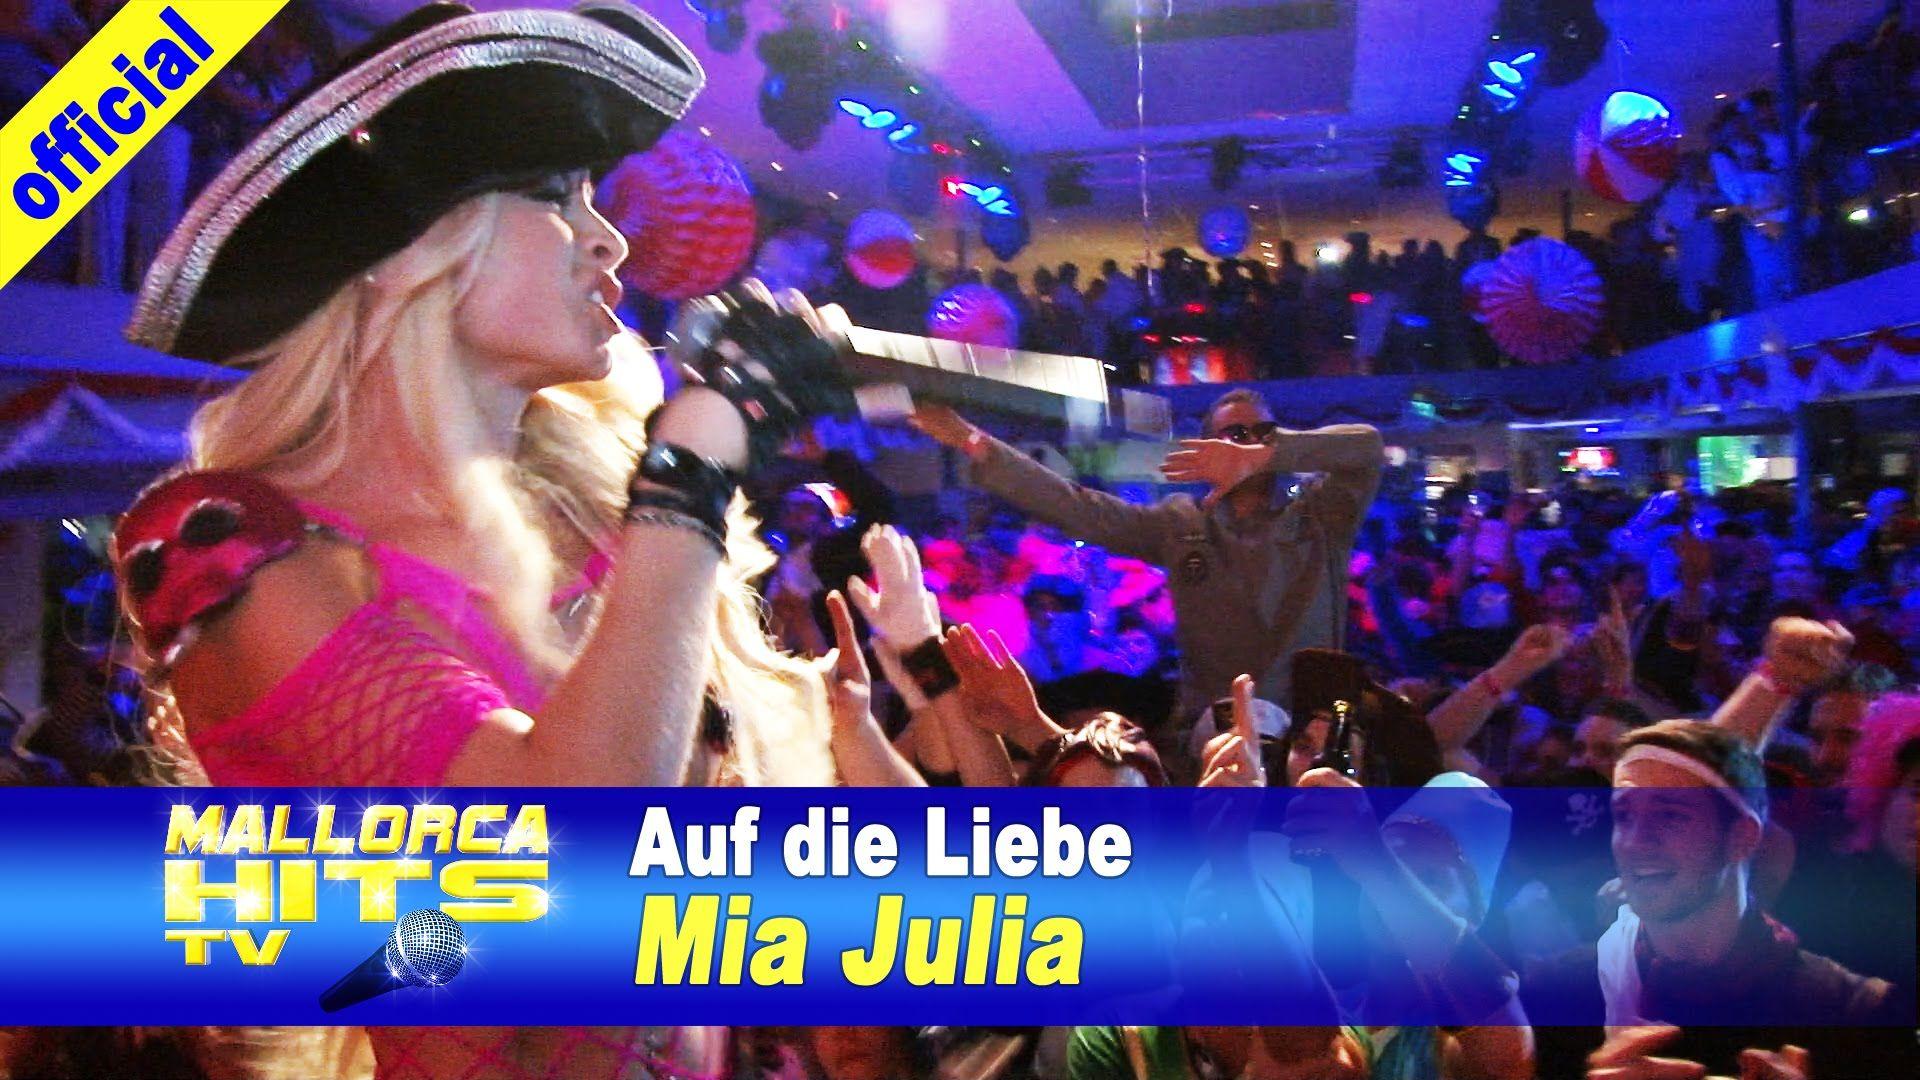 Mia Julia - Auf die Liebe - Ballermann Hits | Ballermann